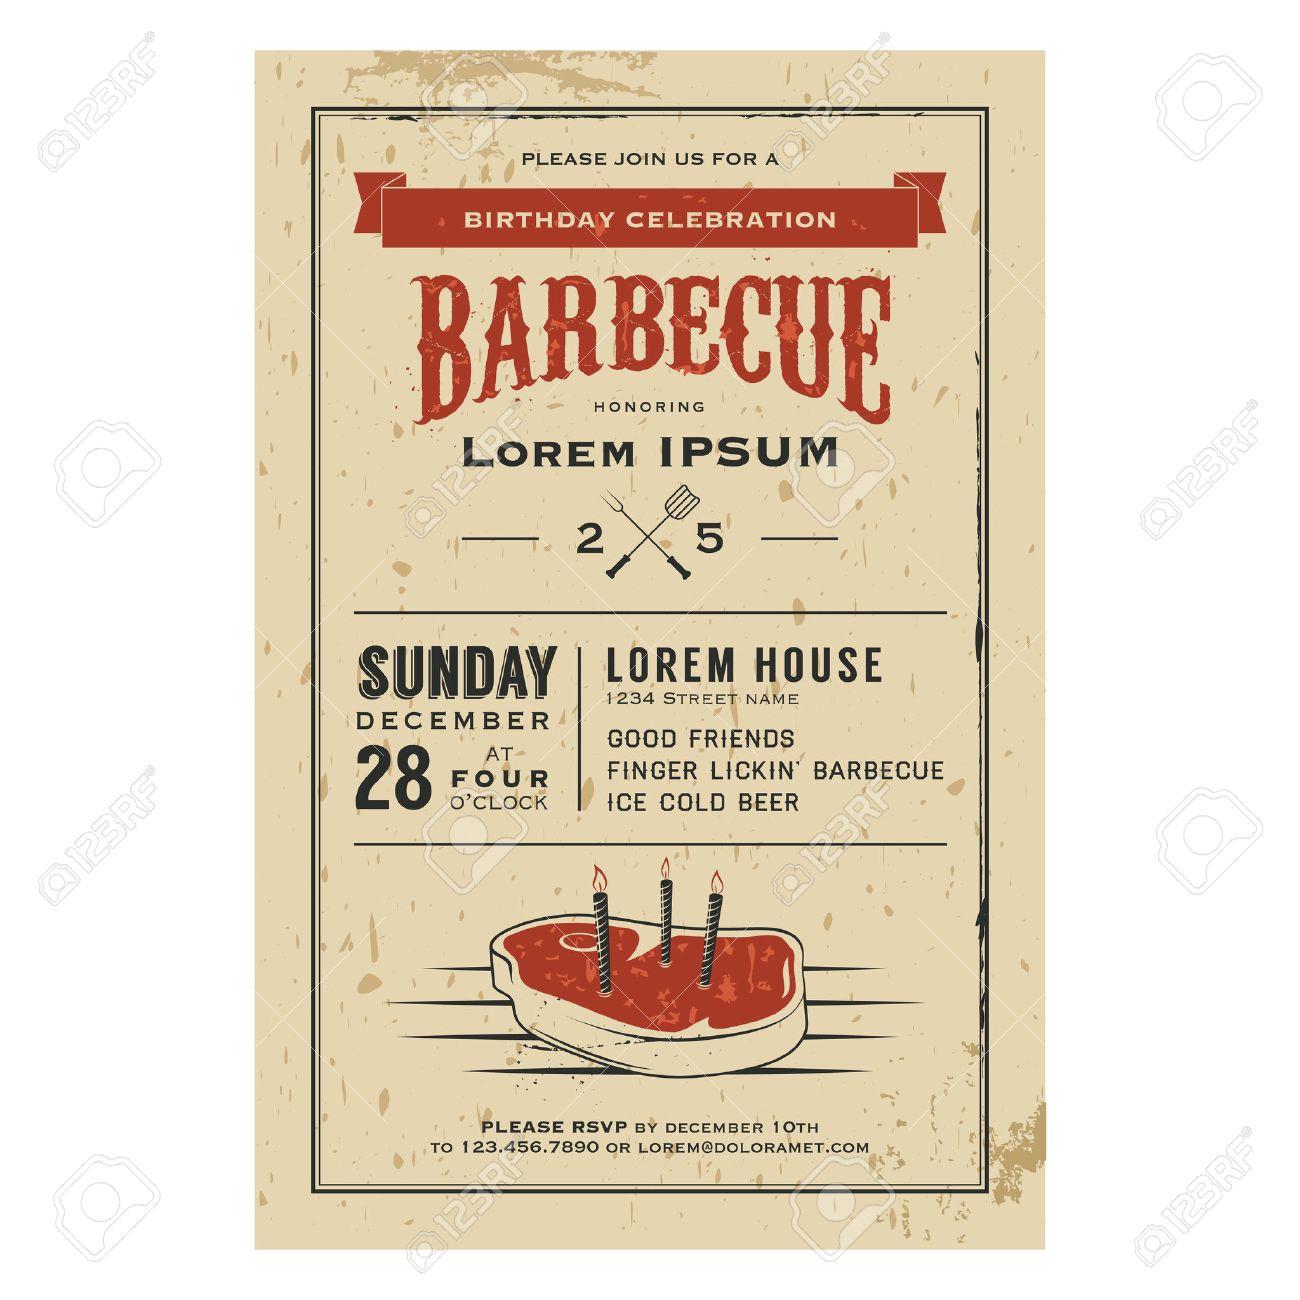 Vintage Birthday Party Barbecue Invitation Royalty Free Cliparts ...